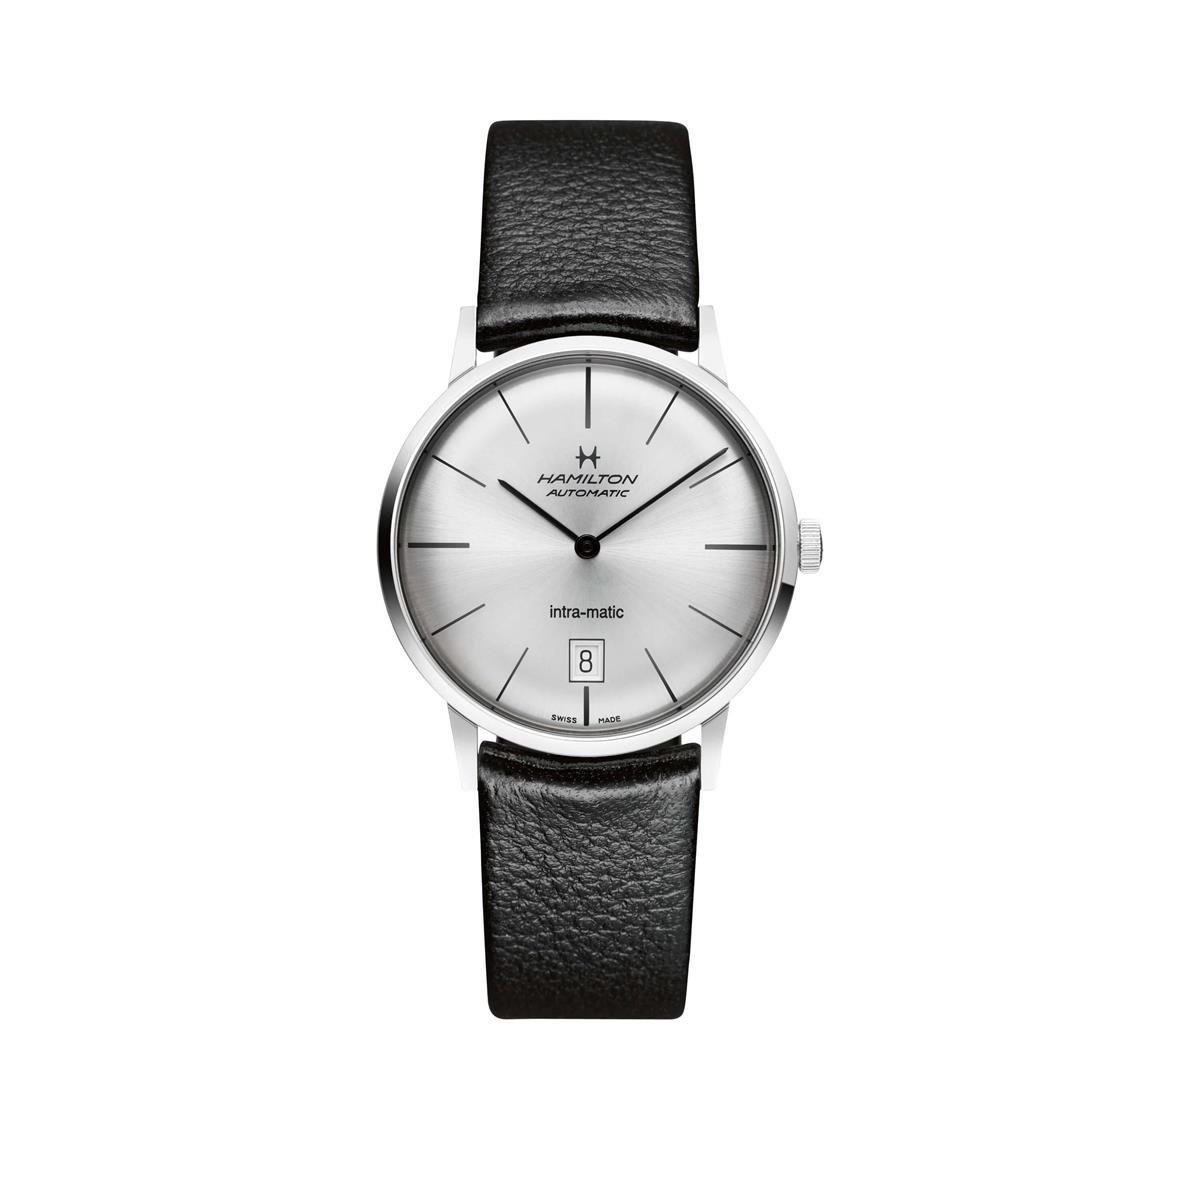 dca0428dc Amazon.com: Hamilton Intra-Matic Black Dial Leather Mens Watch H38455751:  Hamilton: Watches